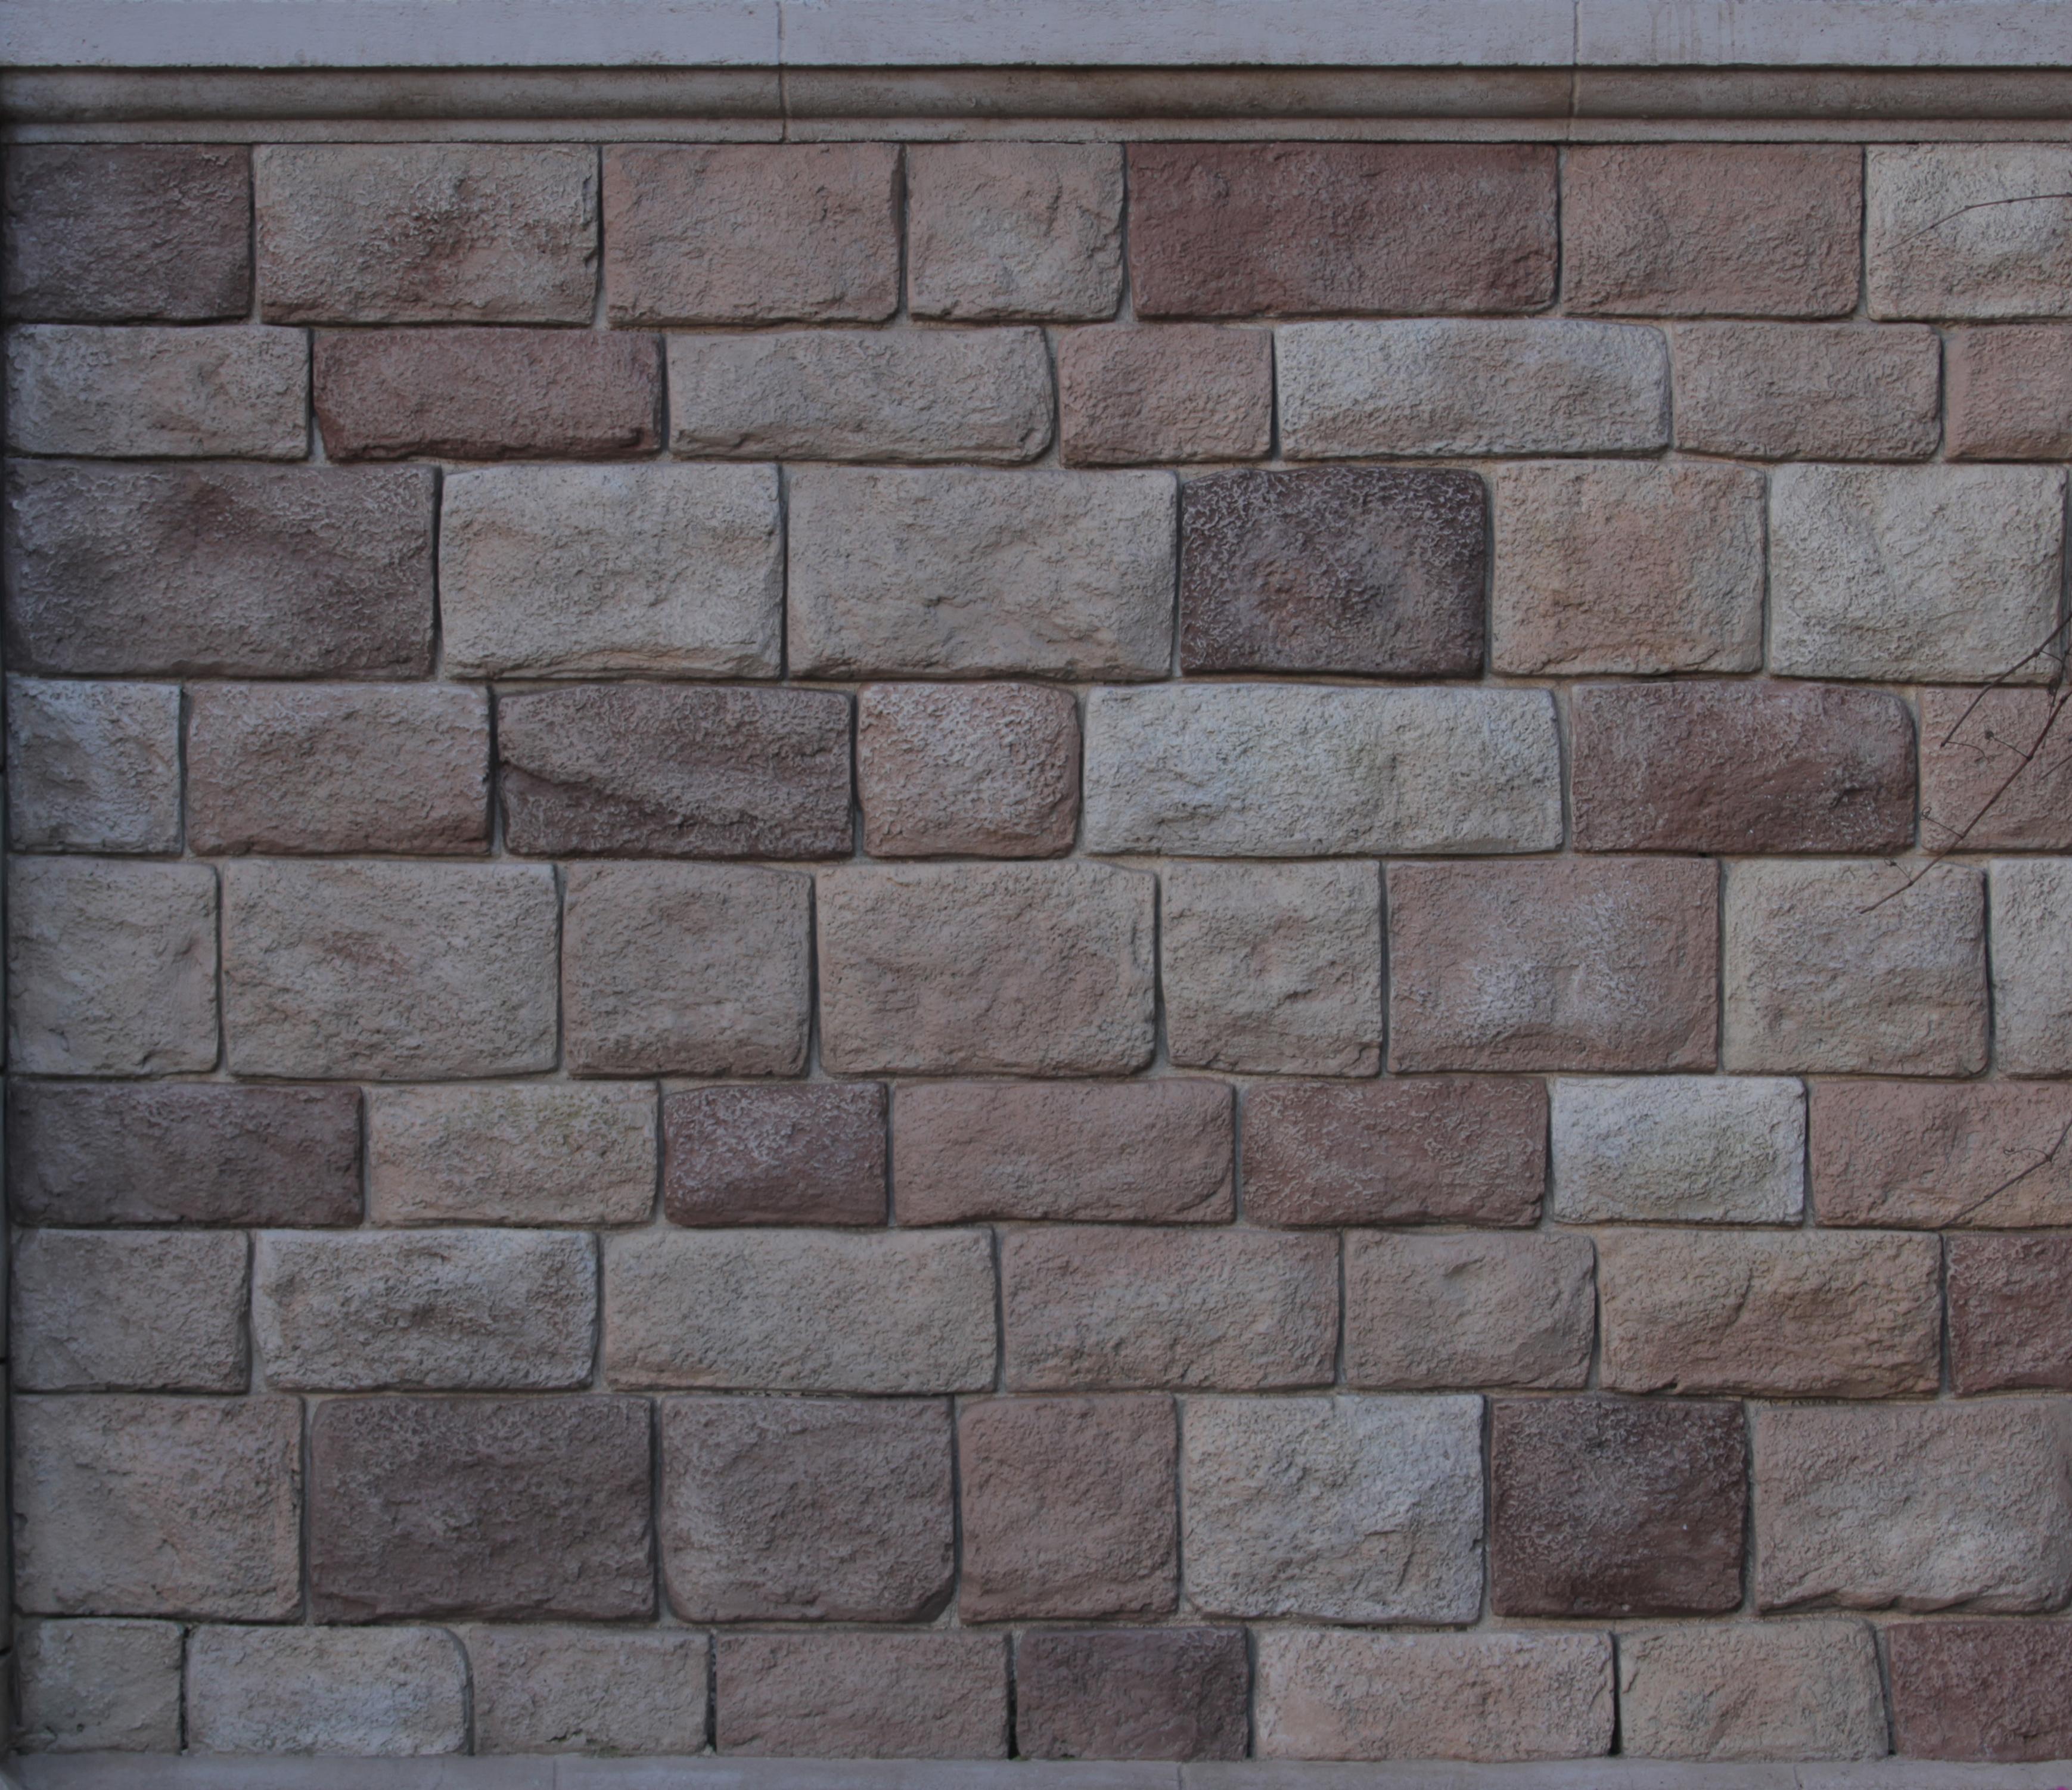 Gray Stone Block Wall - 14Textures